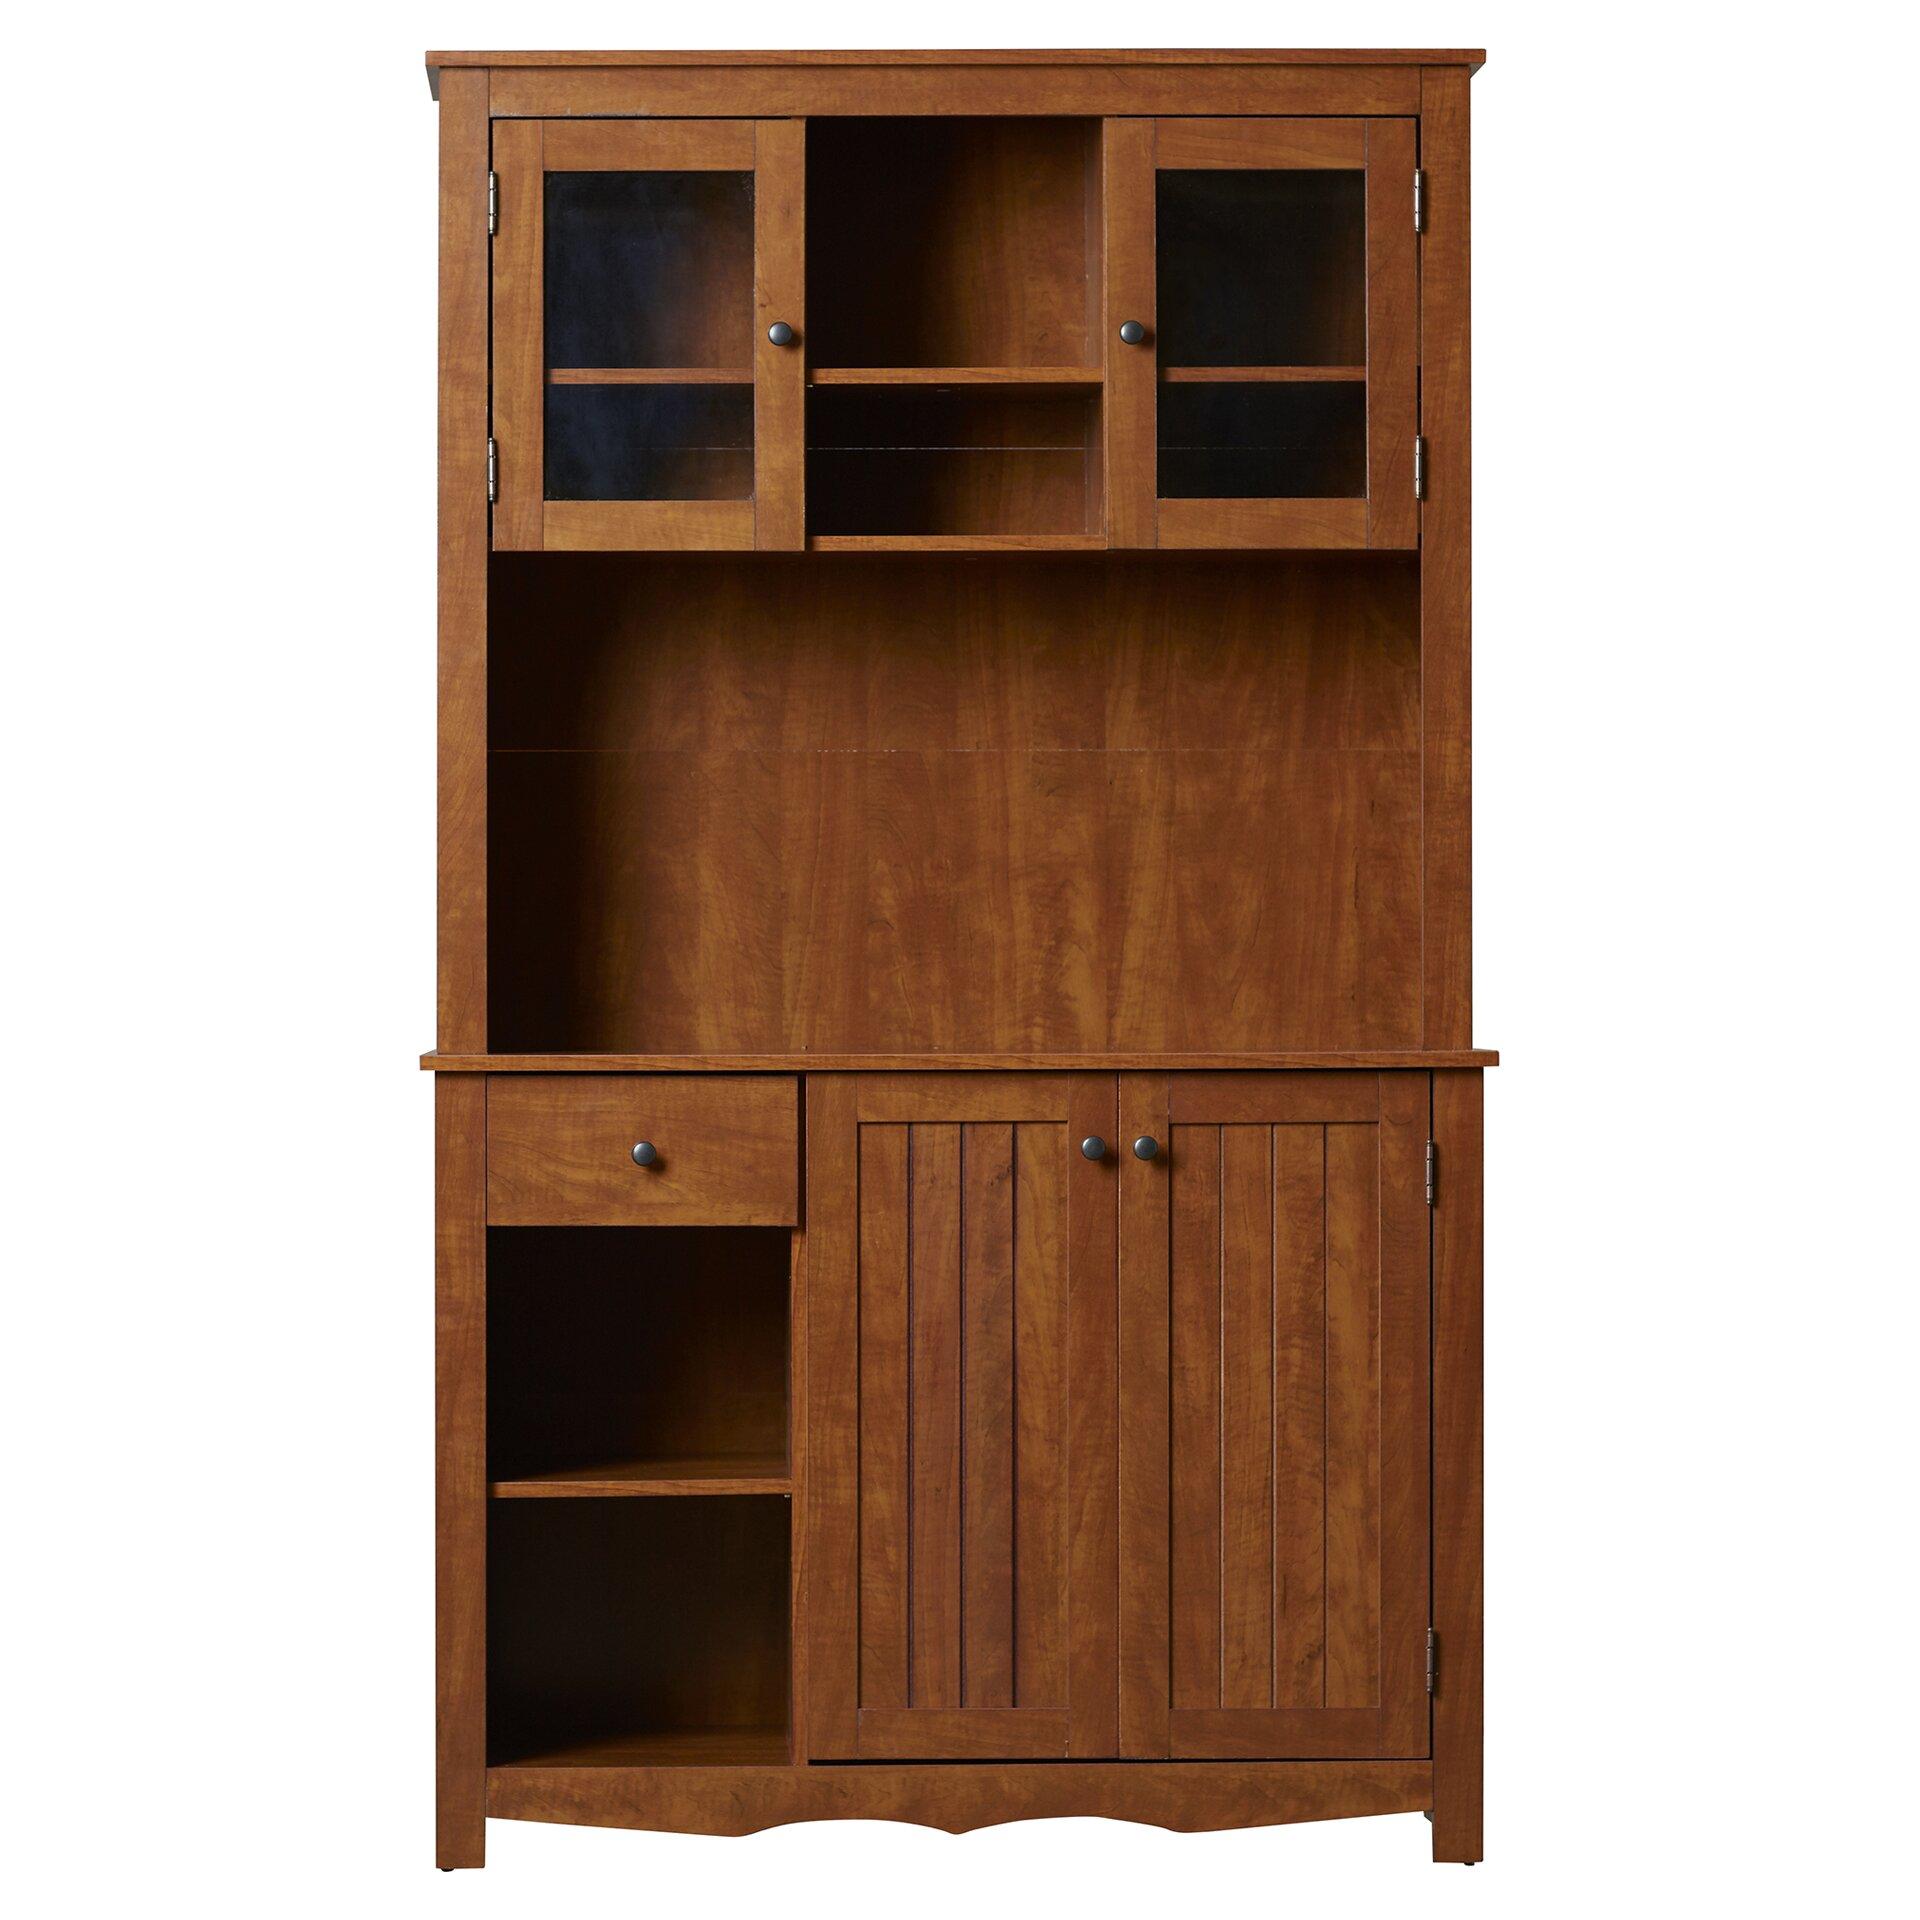 Alcott hill ella china cabinet reviews wayfair for Wayfair kitchen cabinets